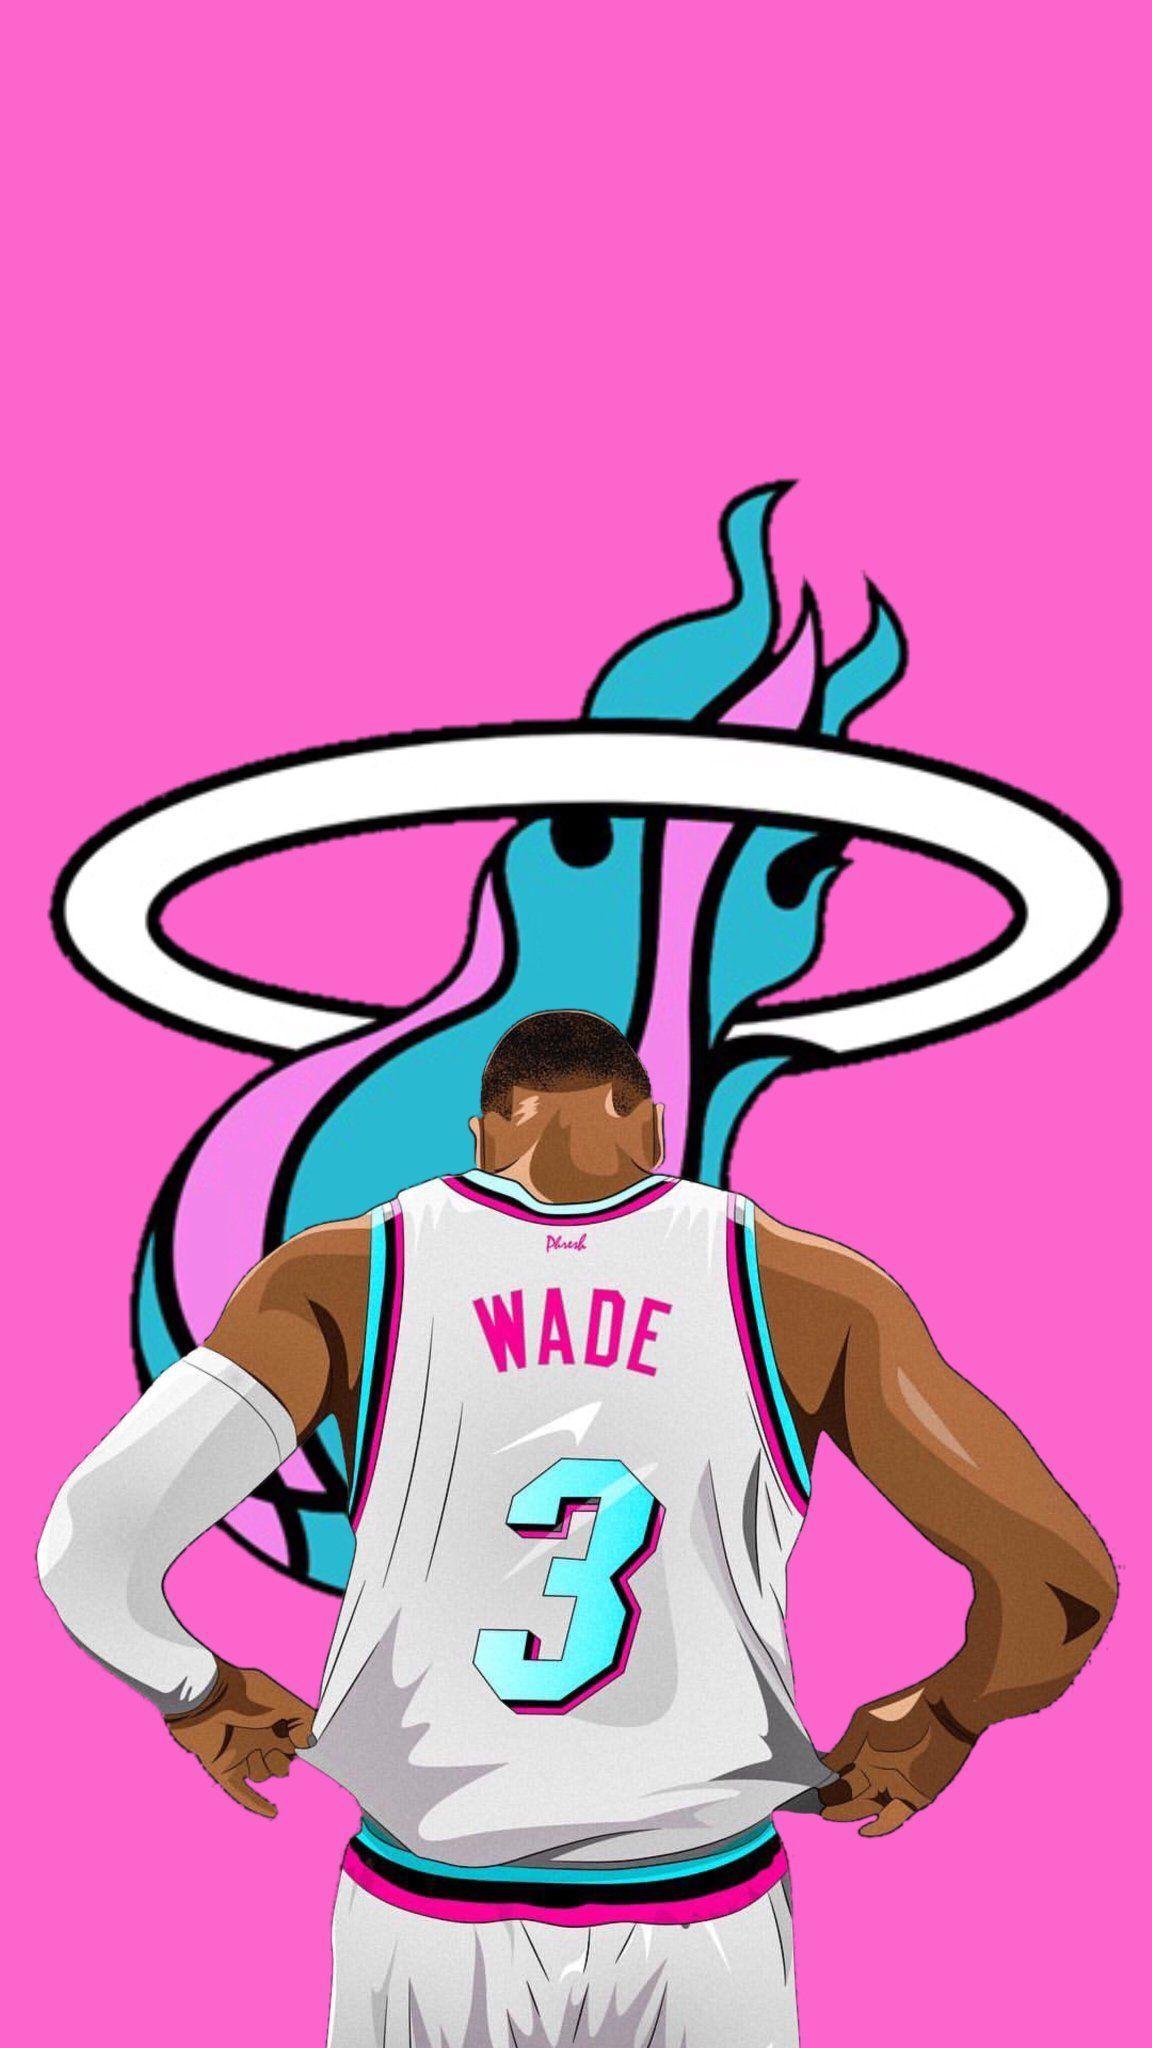 D Wade Miami Heat Wallpaper Basketball Nba Wallpapers Basketball Wallpaper Nba Pictures